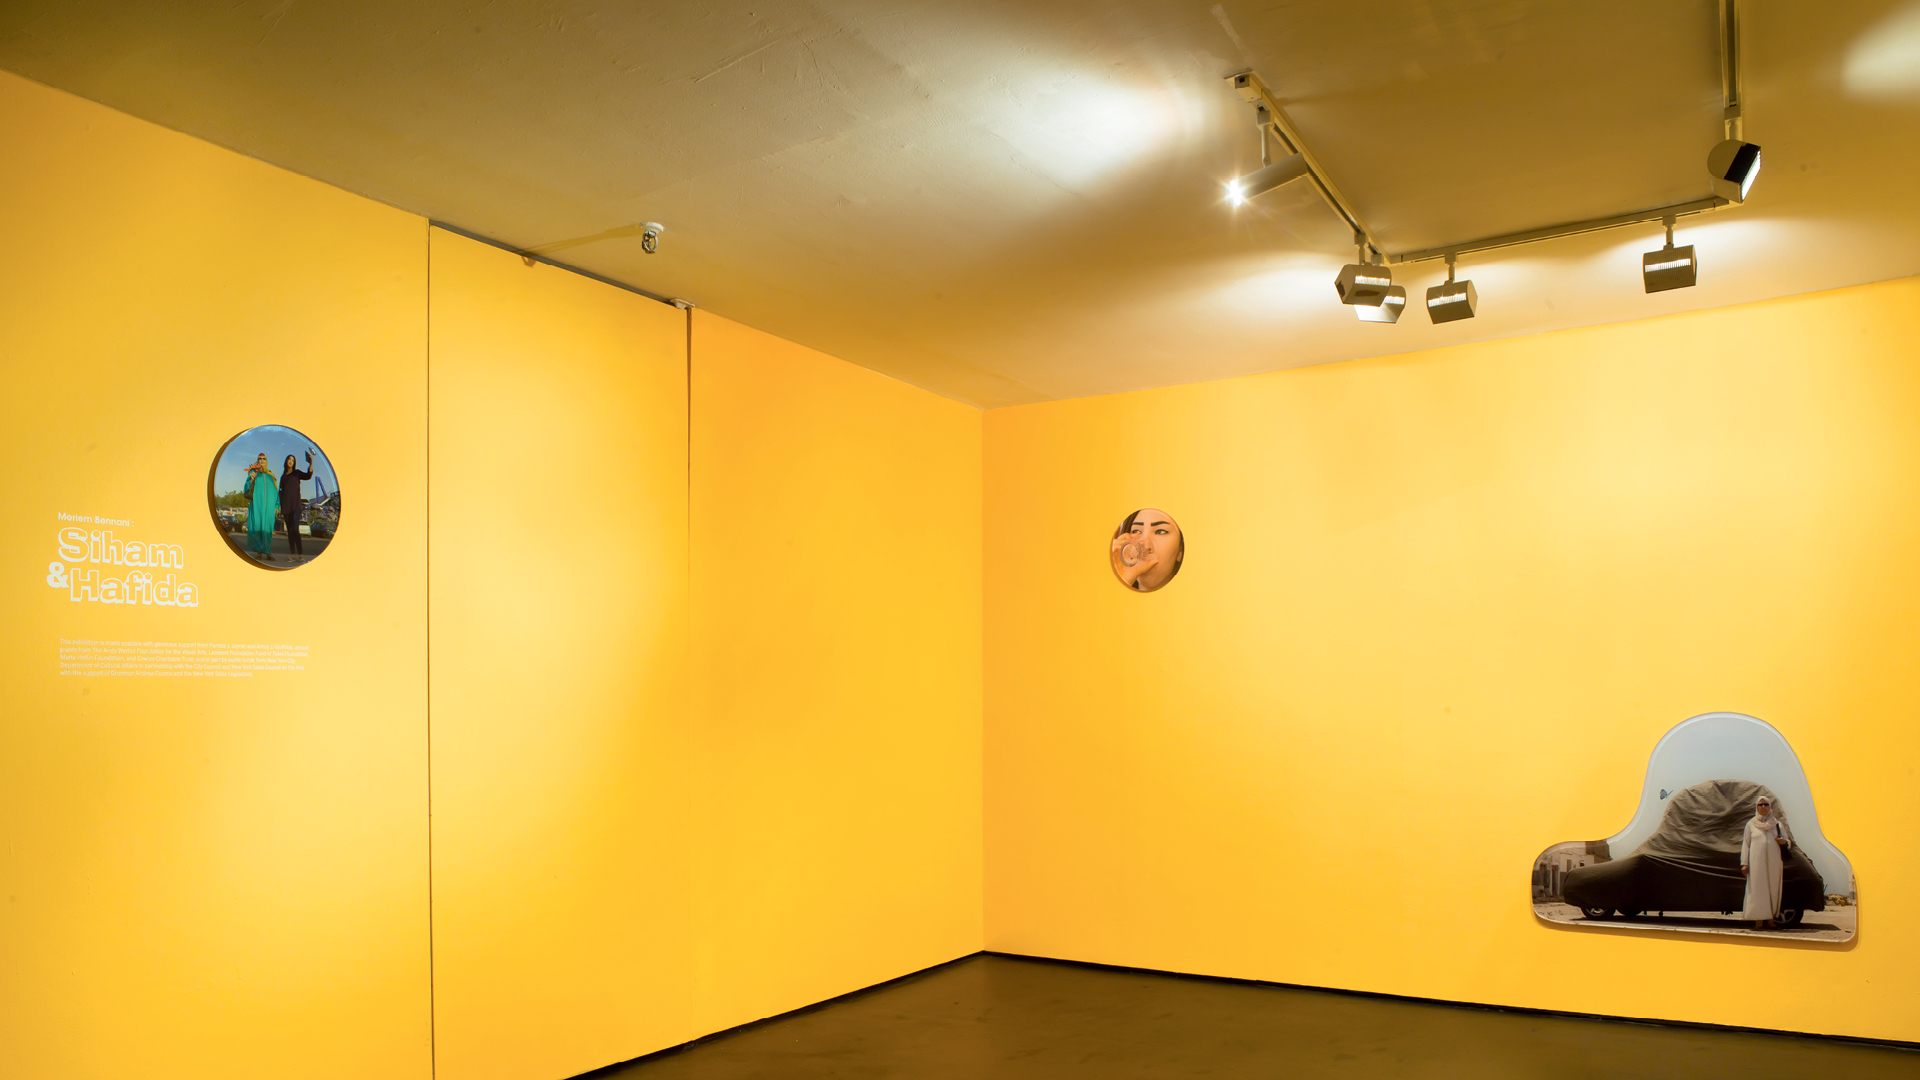 Moroccan Artist Meriem Bennani Is Blurring The Lines Between Art And Film